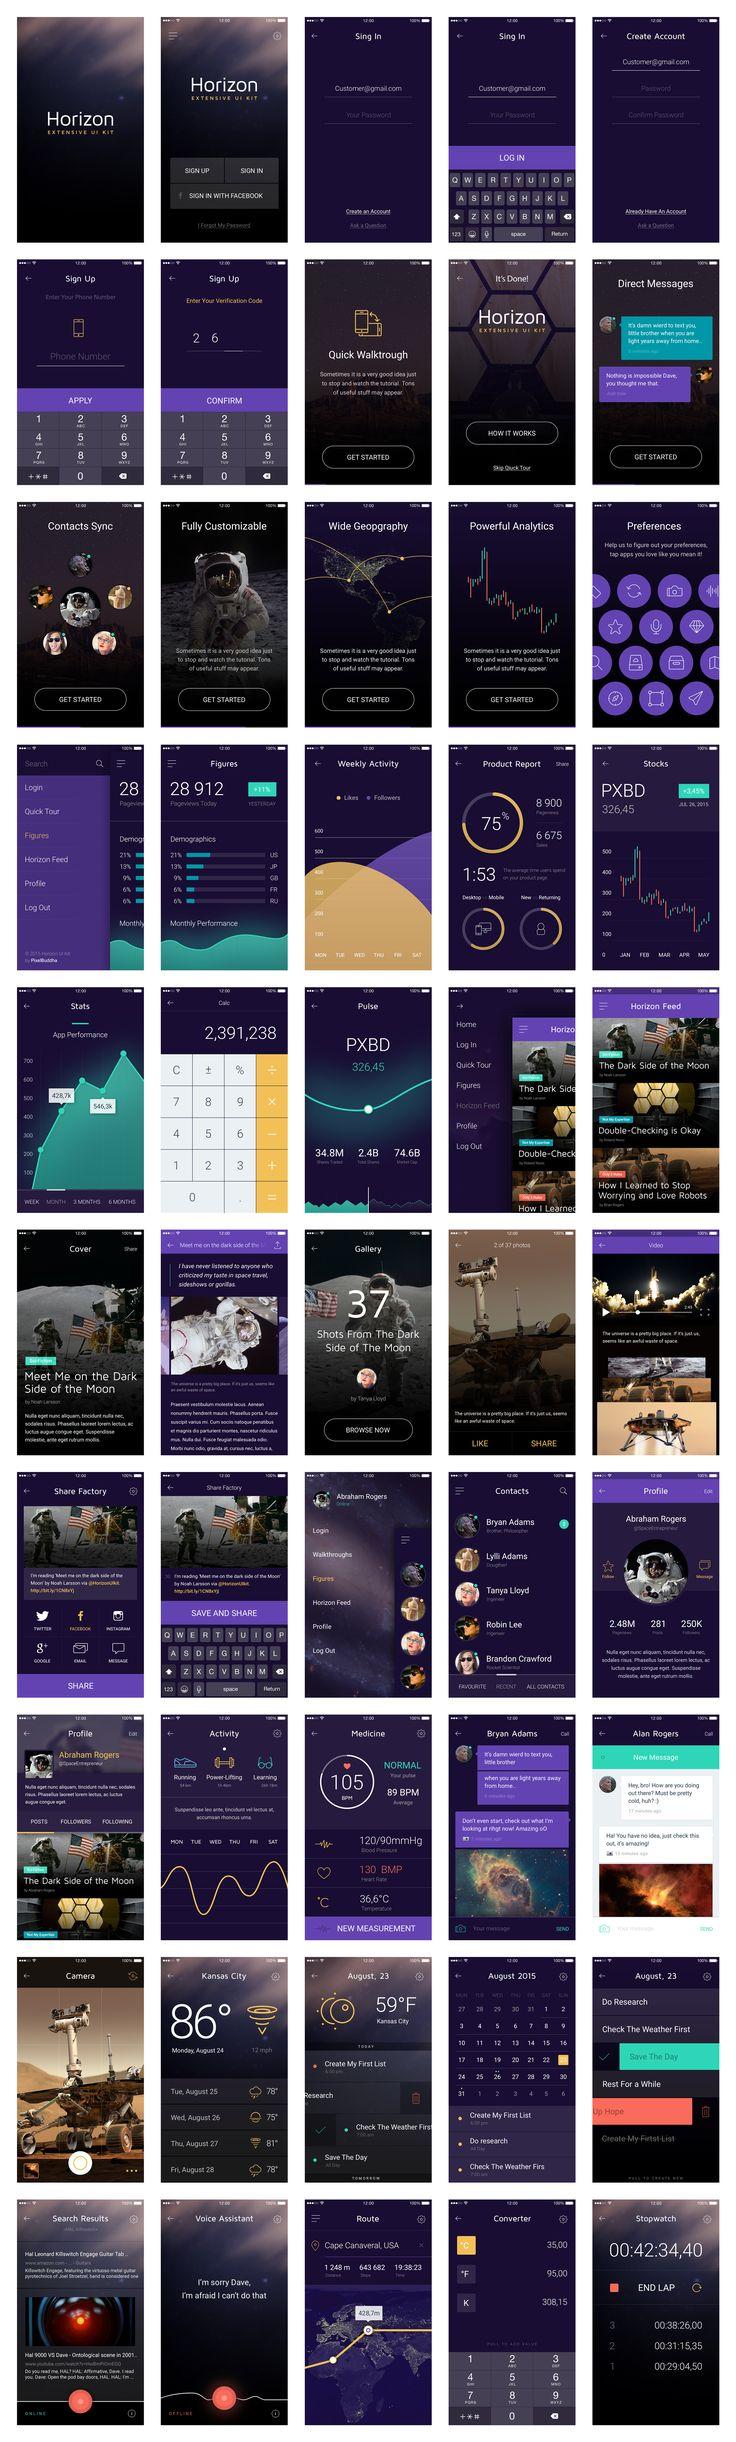 Horizontal UI kit - Great referencing for digital applications design…